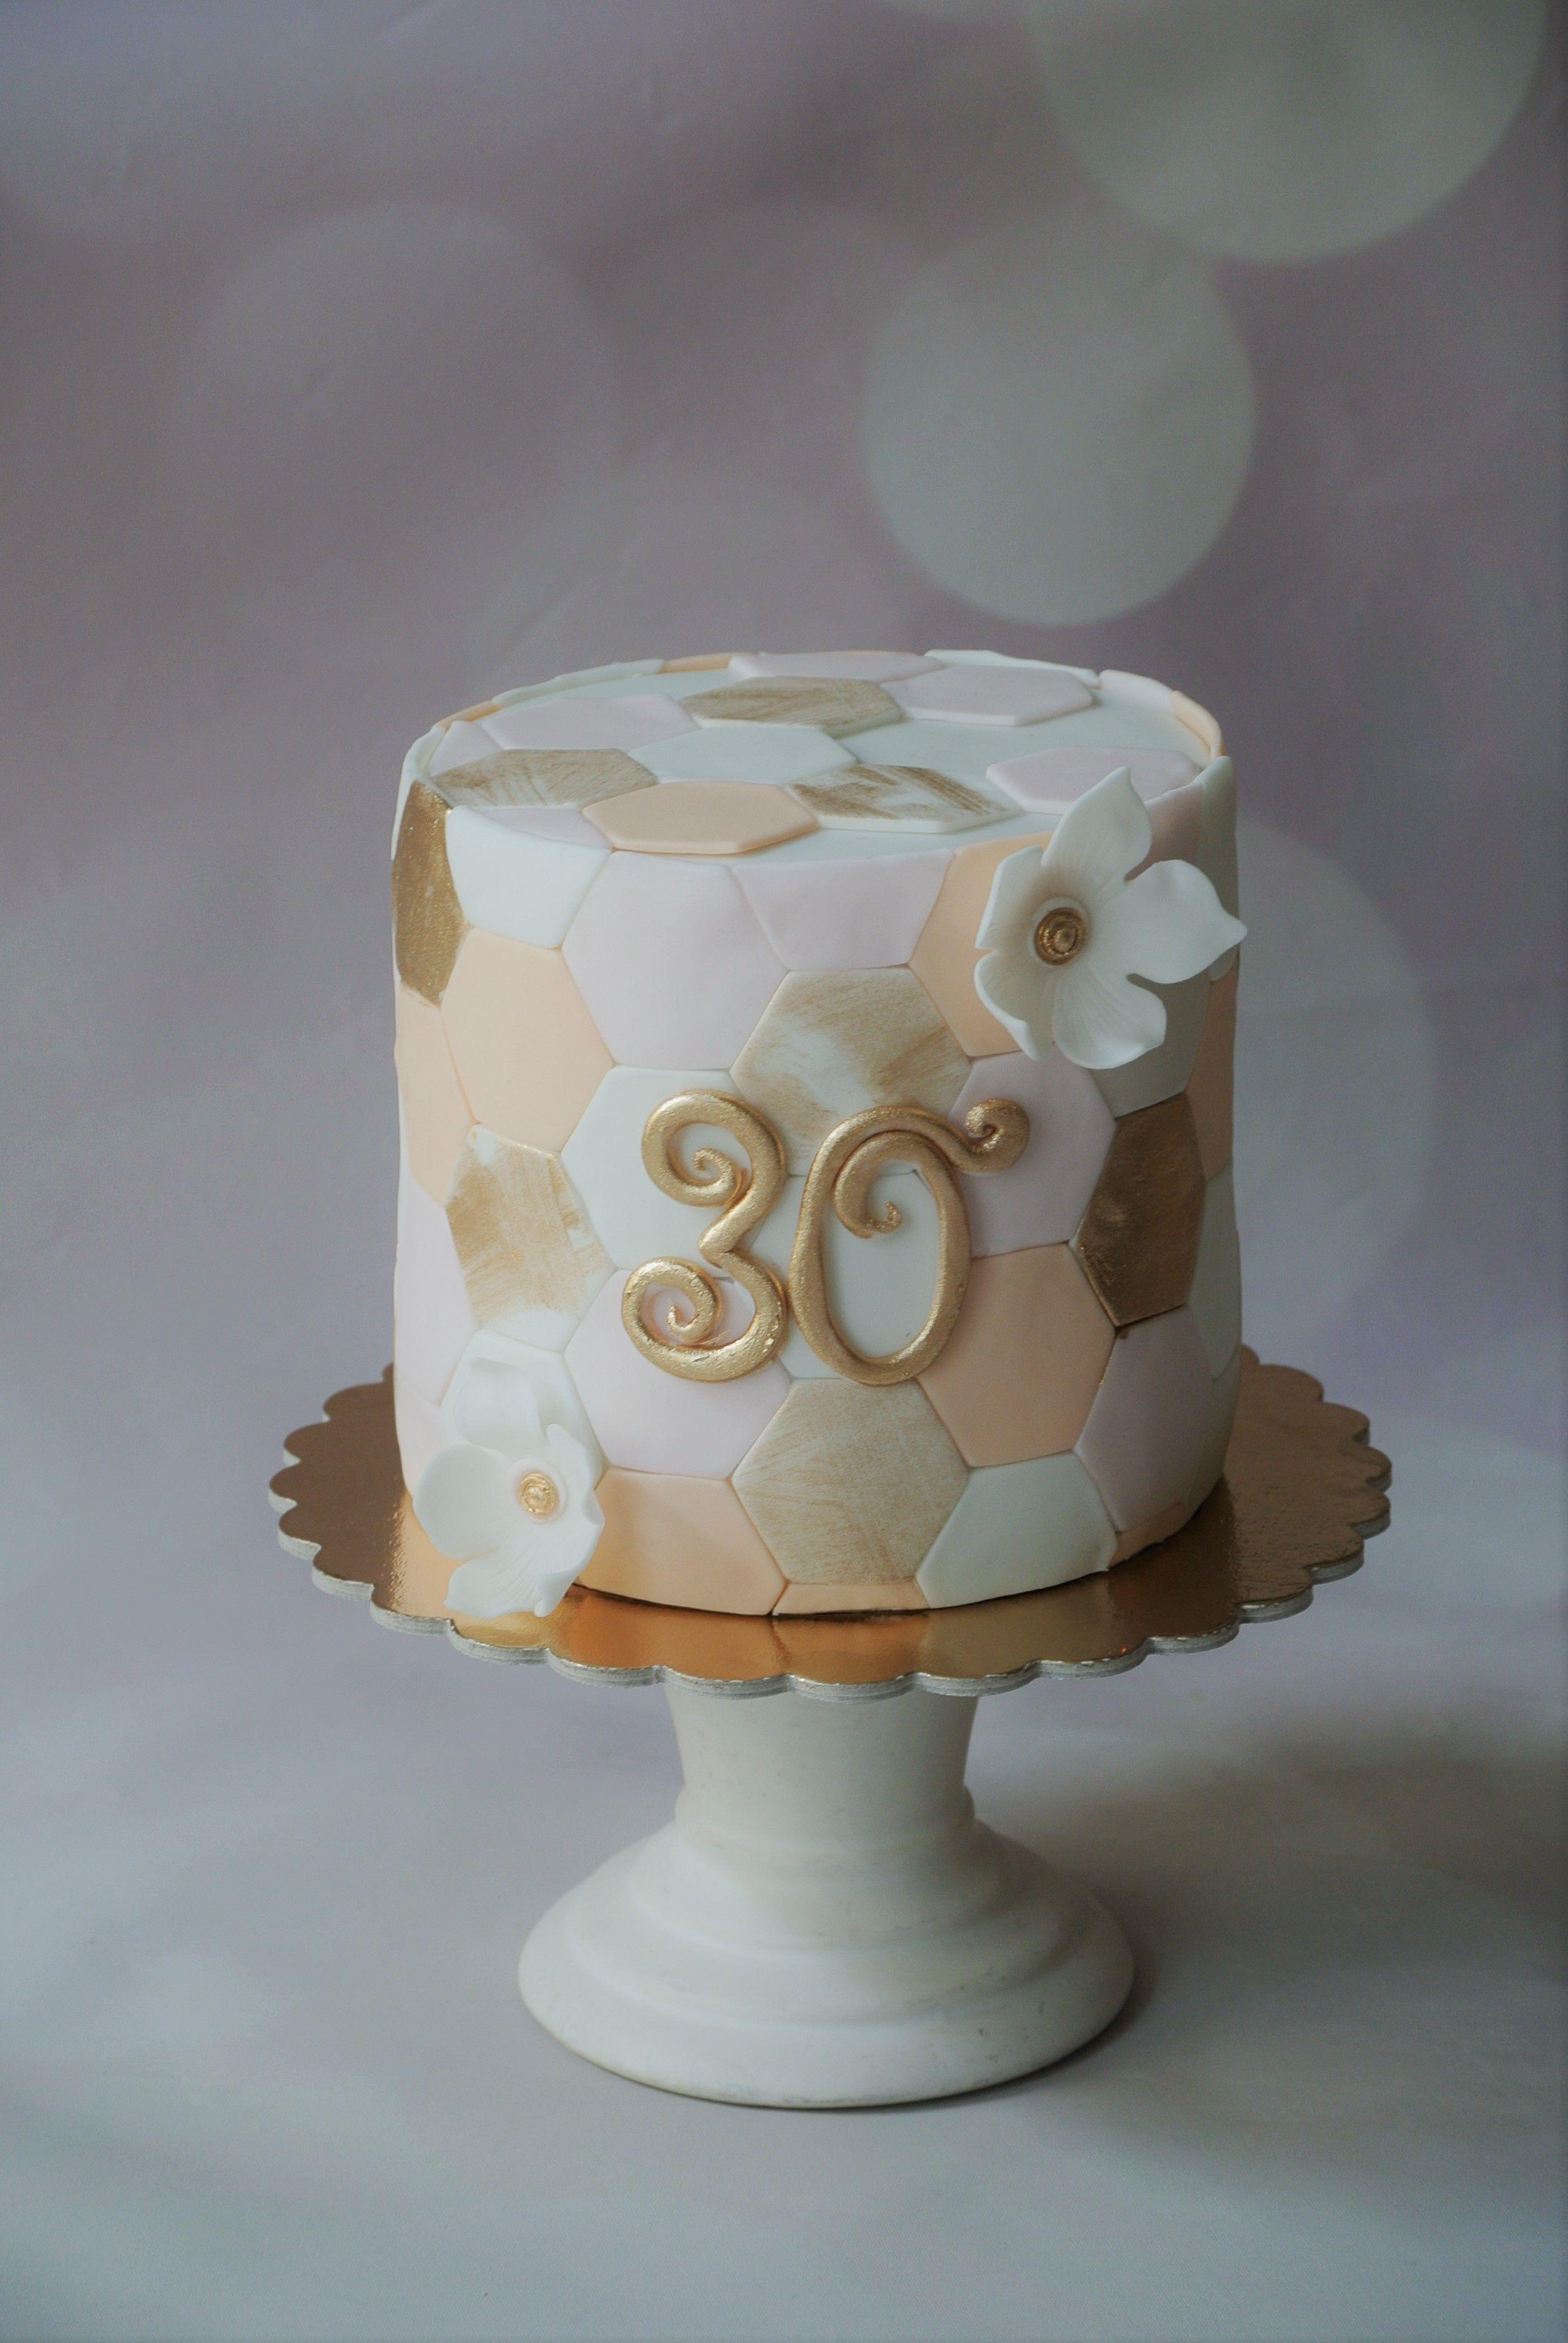 30th birthday cake 30 cake 30 birthday cake cake